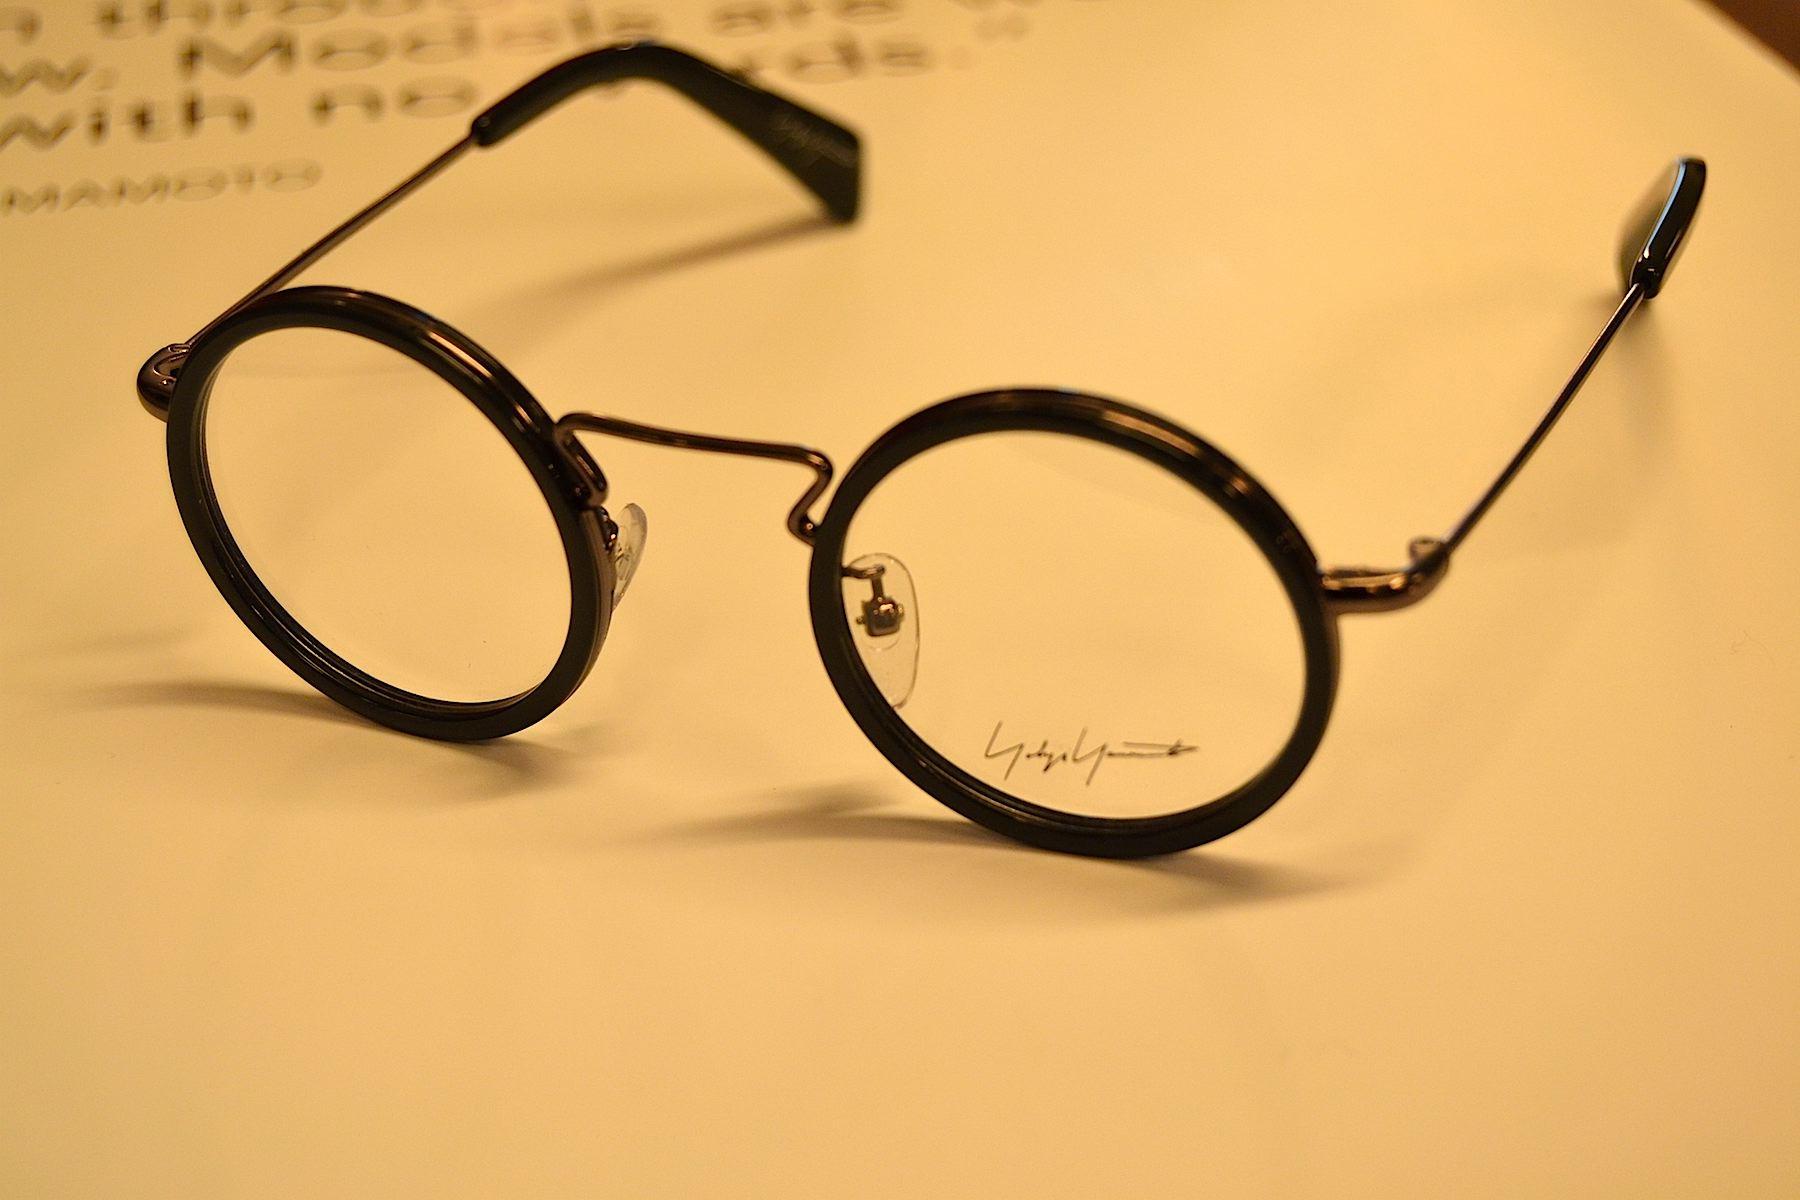 lenastore-bergamo-lenafashion-shop-online-yohji-yamamoto-gli-occhiali-sunglasses-6